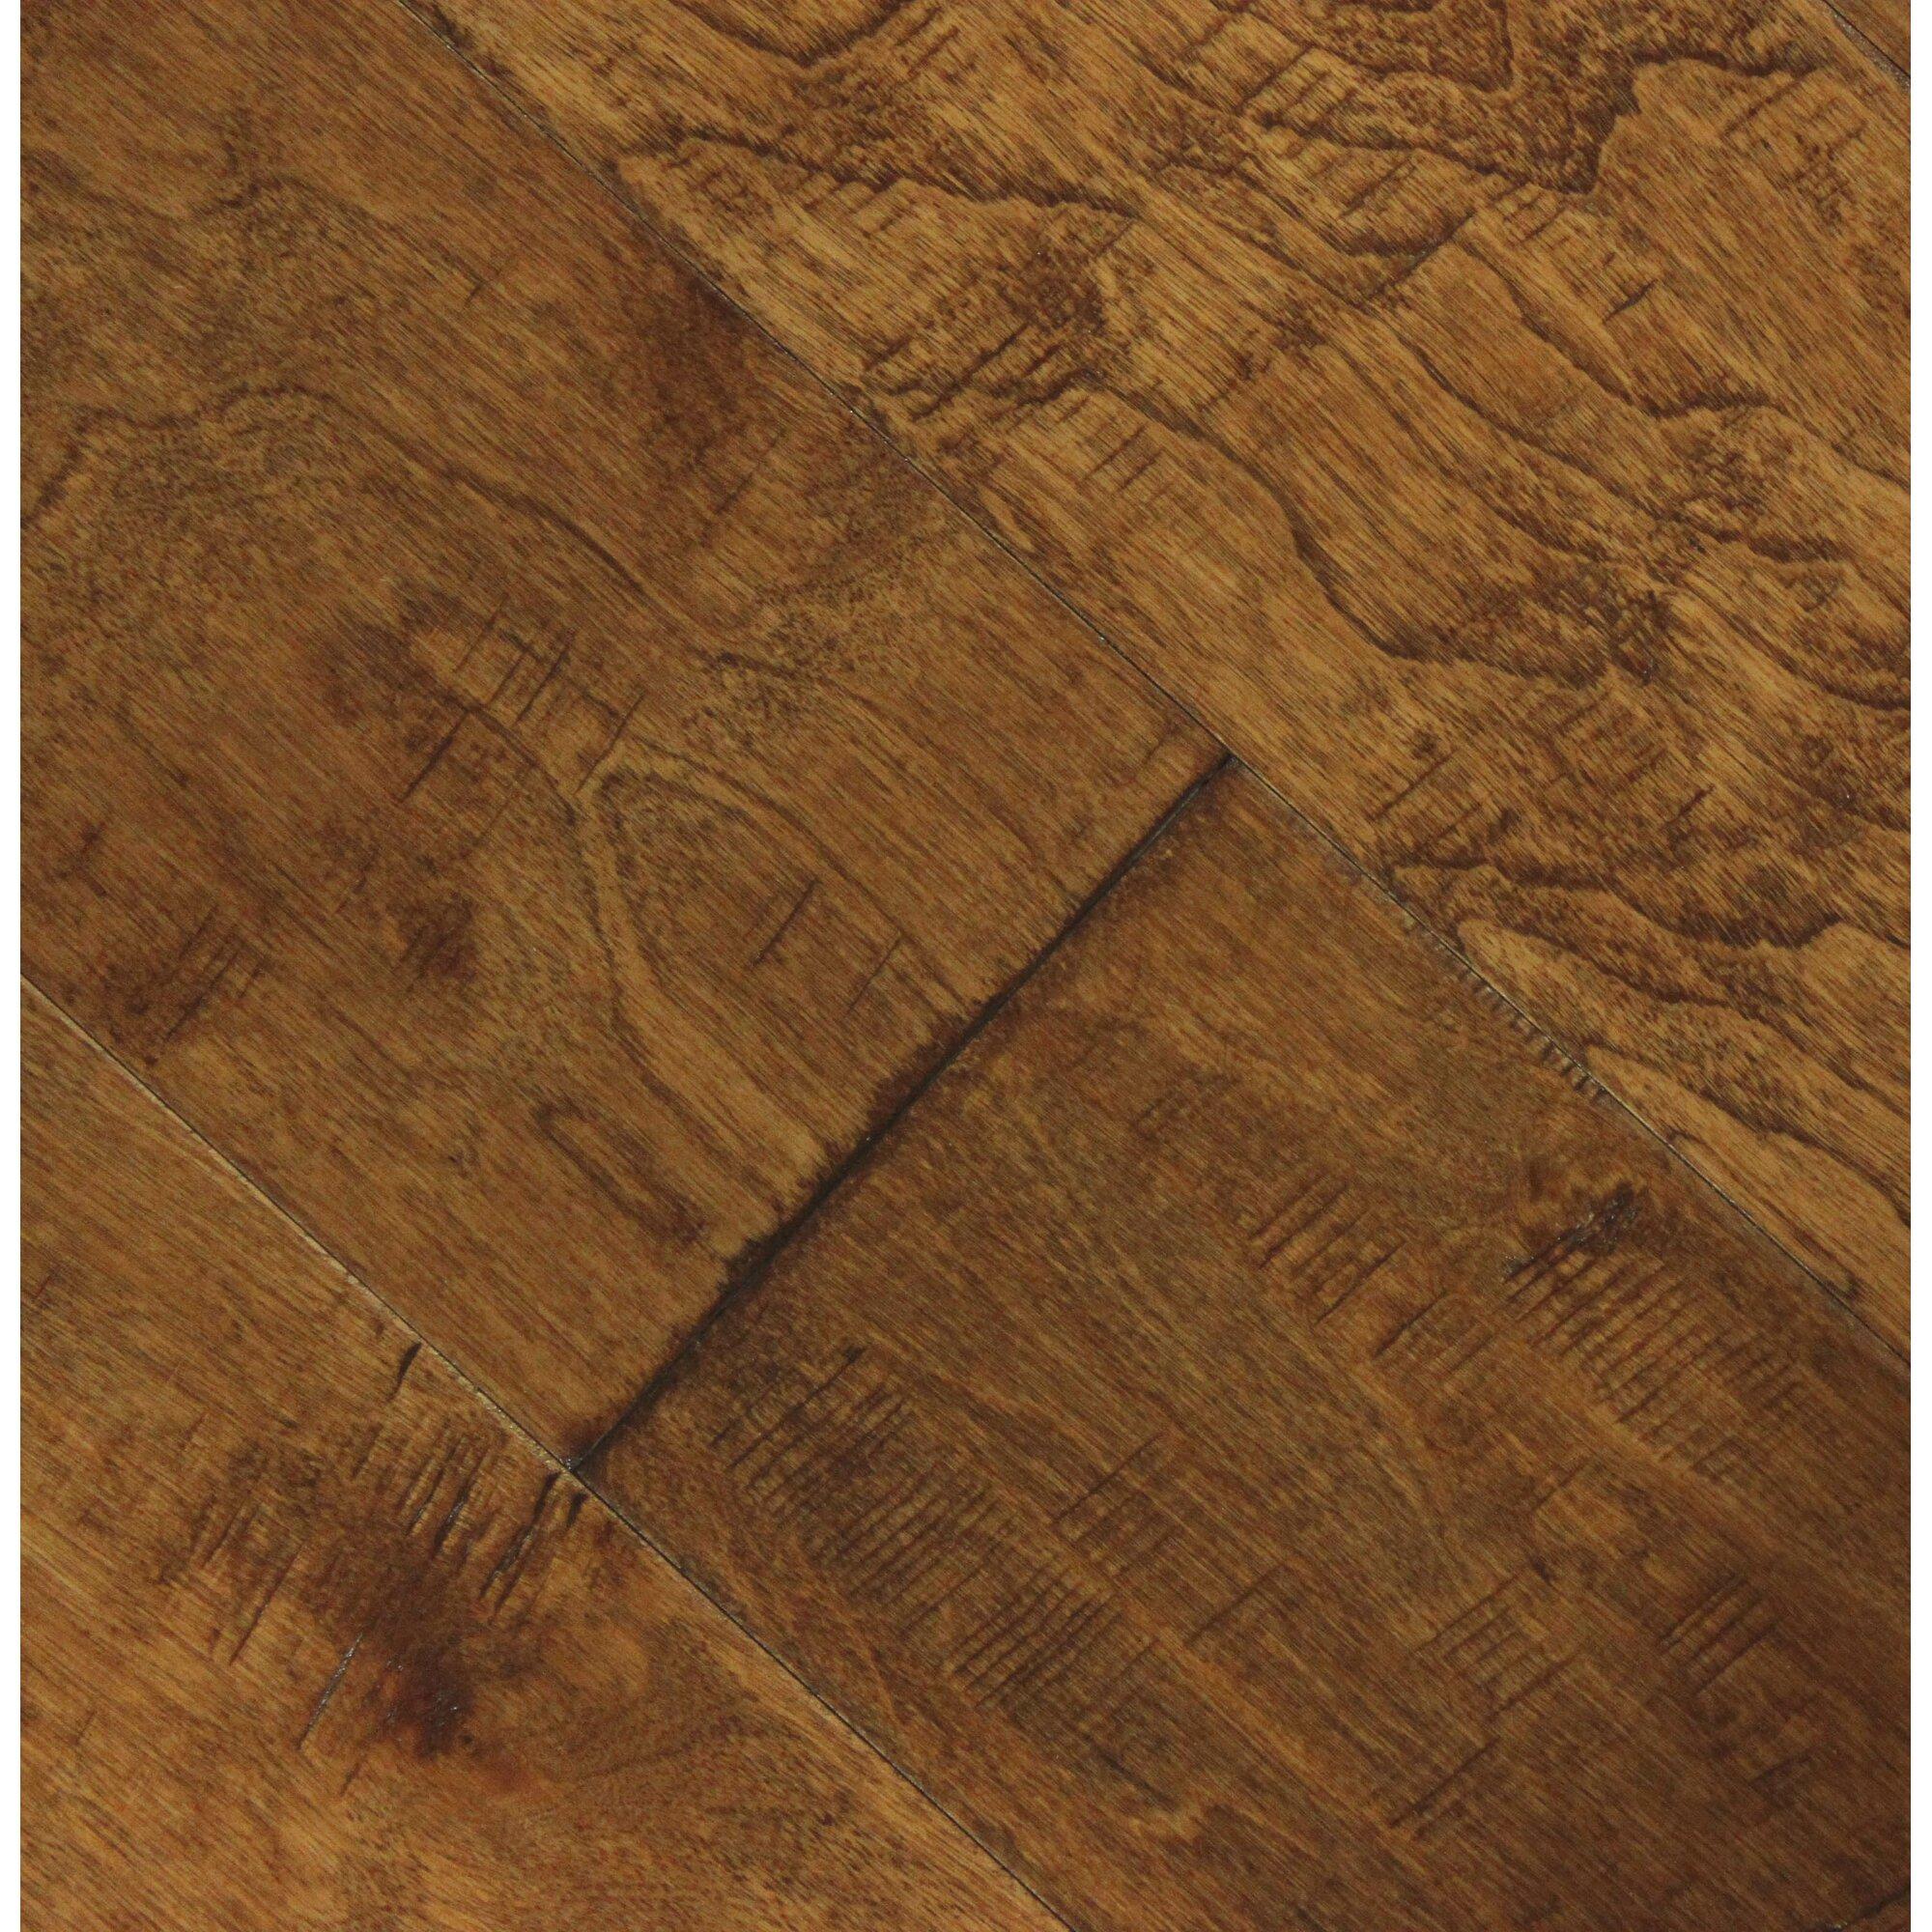 Birch Hardwood Flooring birch marsh field hardwood esp5302lg Pioneer 5 Engineered Birch Hardwood Flooring In Homestead